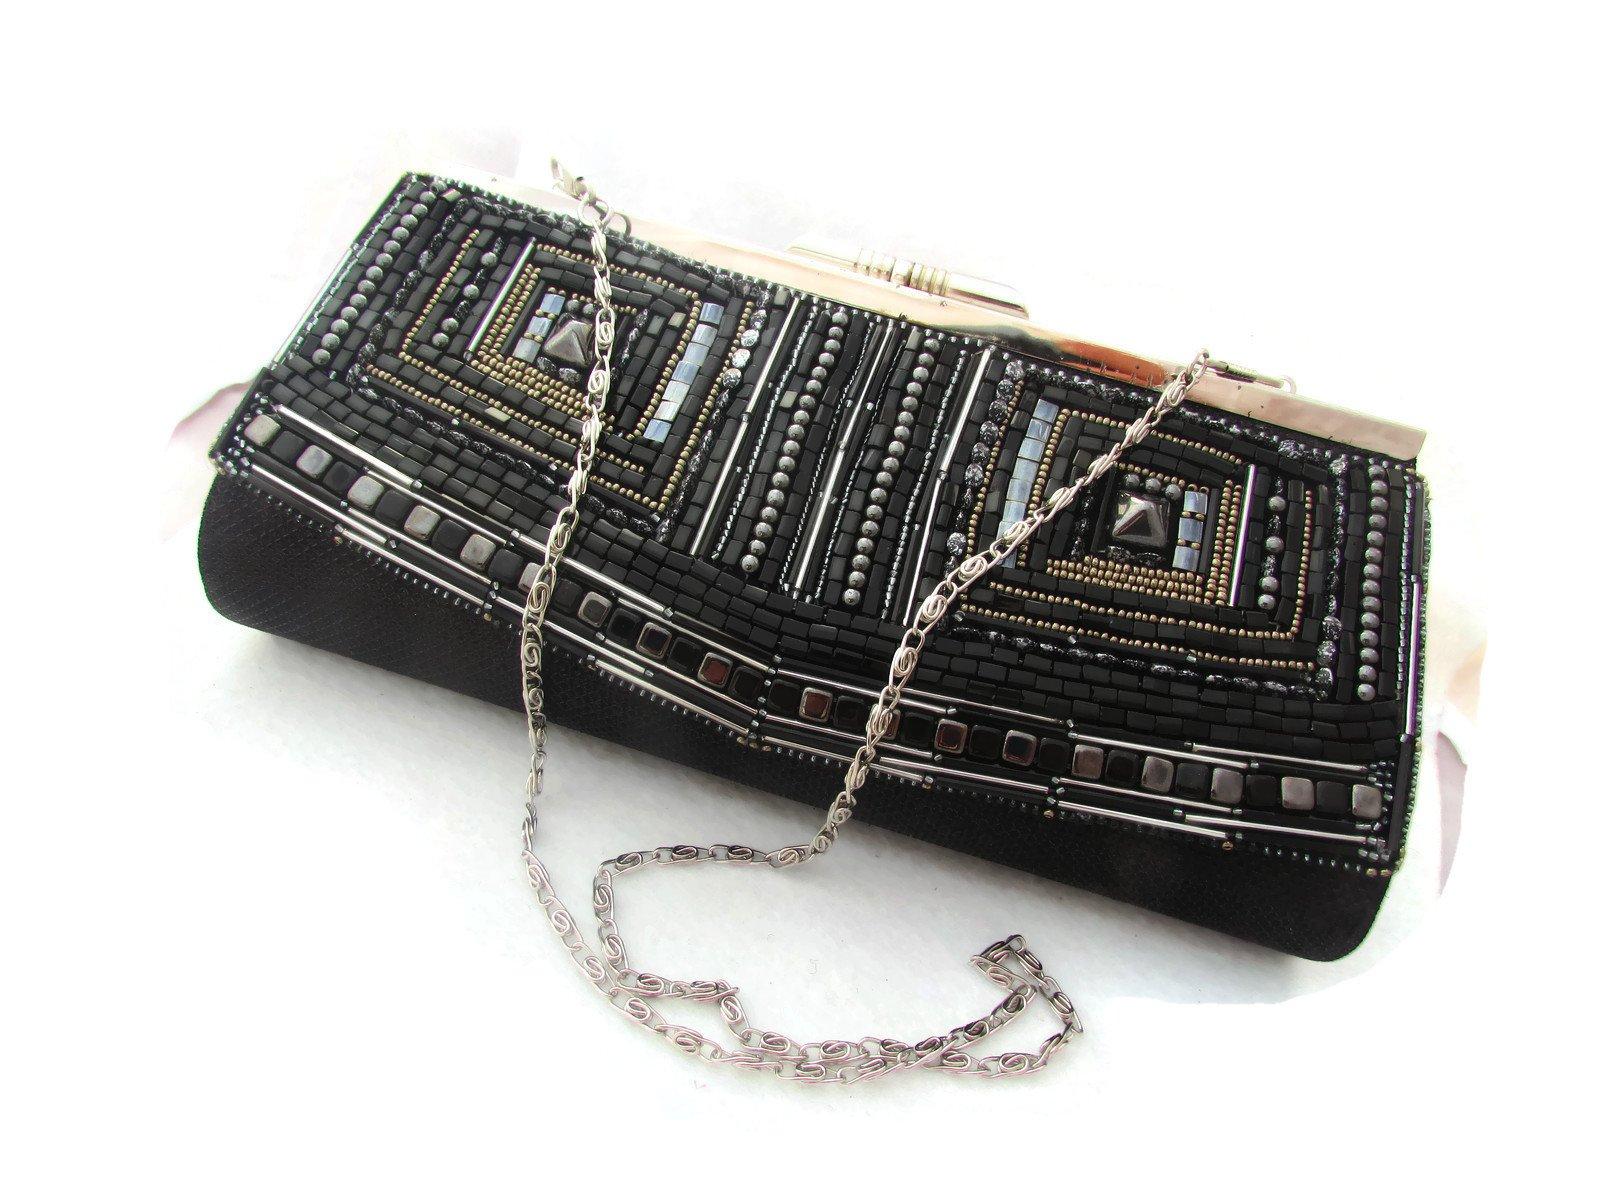 Original black silver gunmetal handmade bead embroidered artisan jewelry purse handbag pouch clutch - Black chess